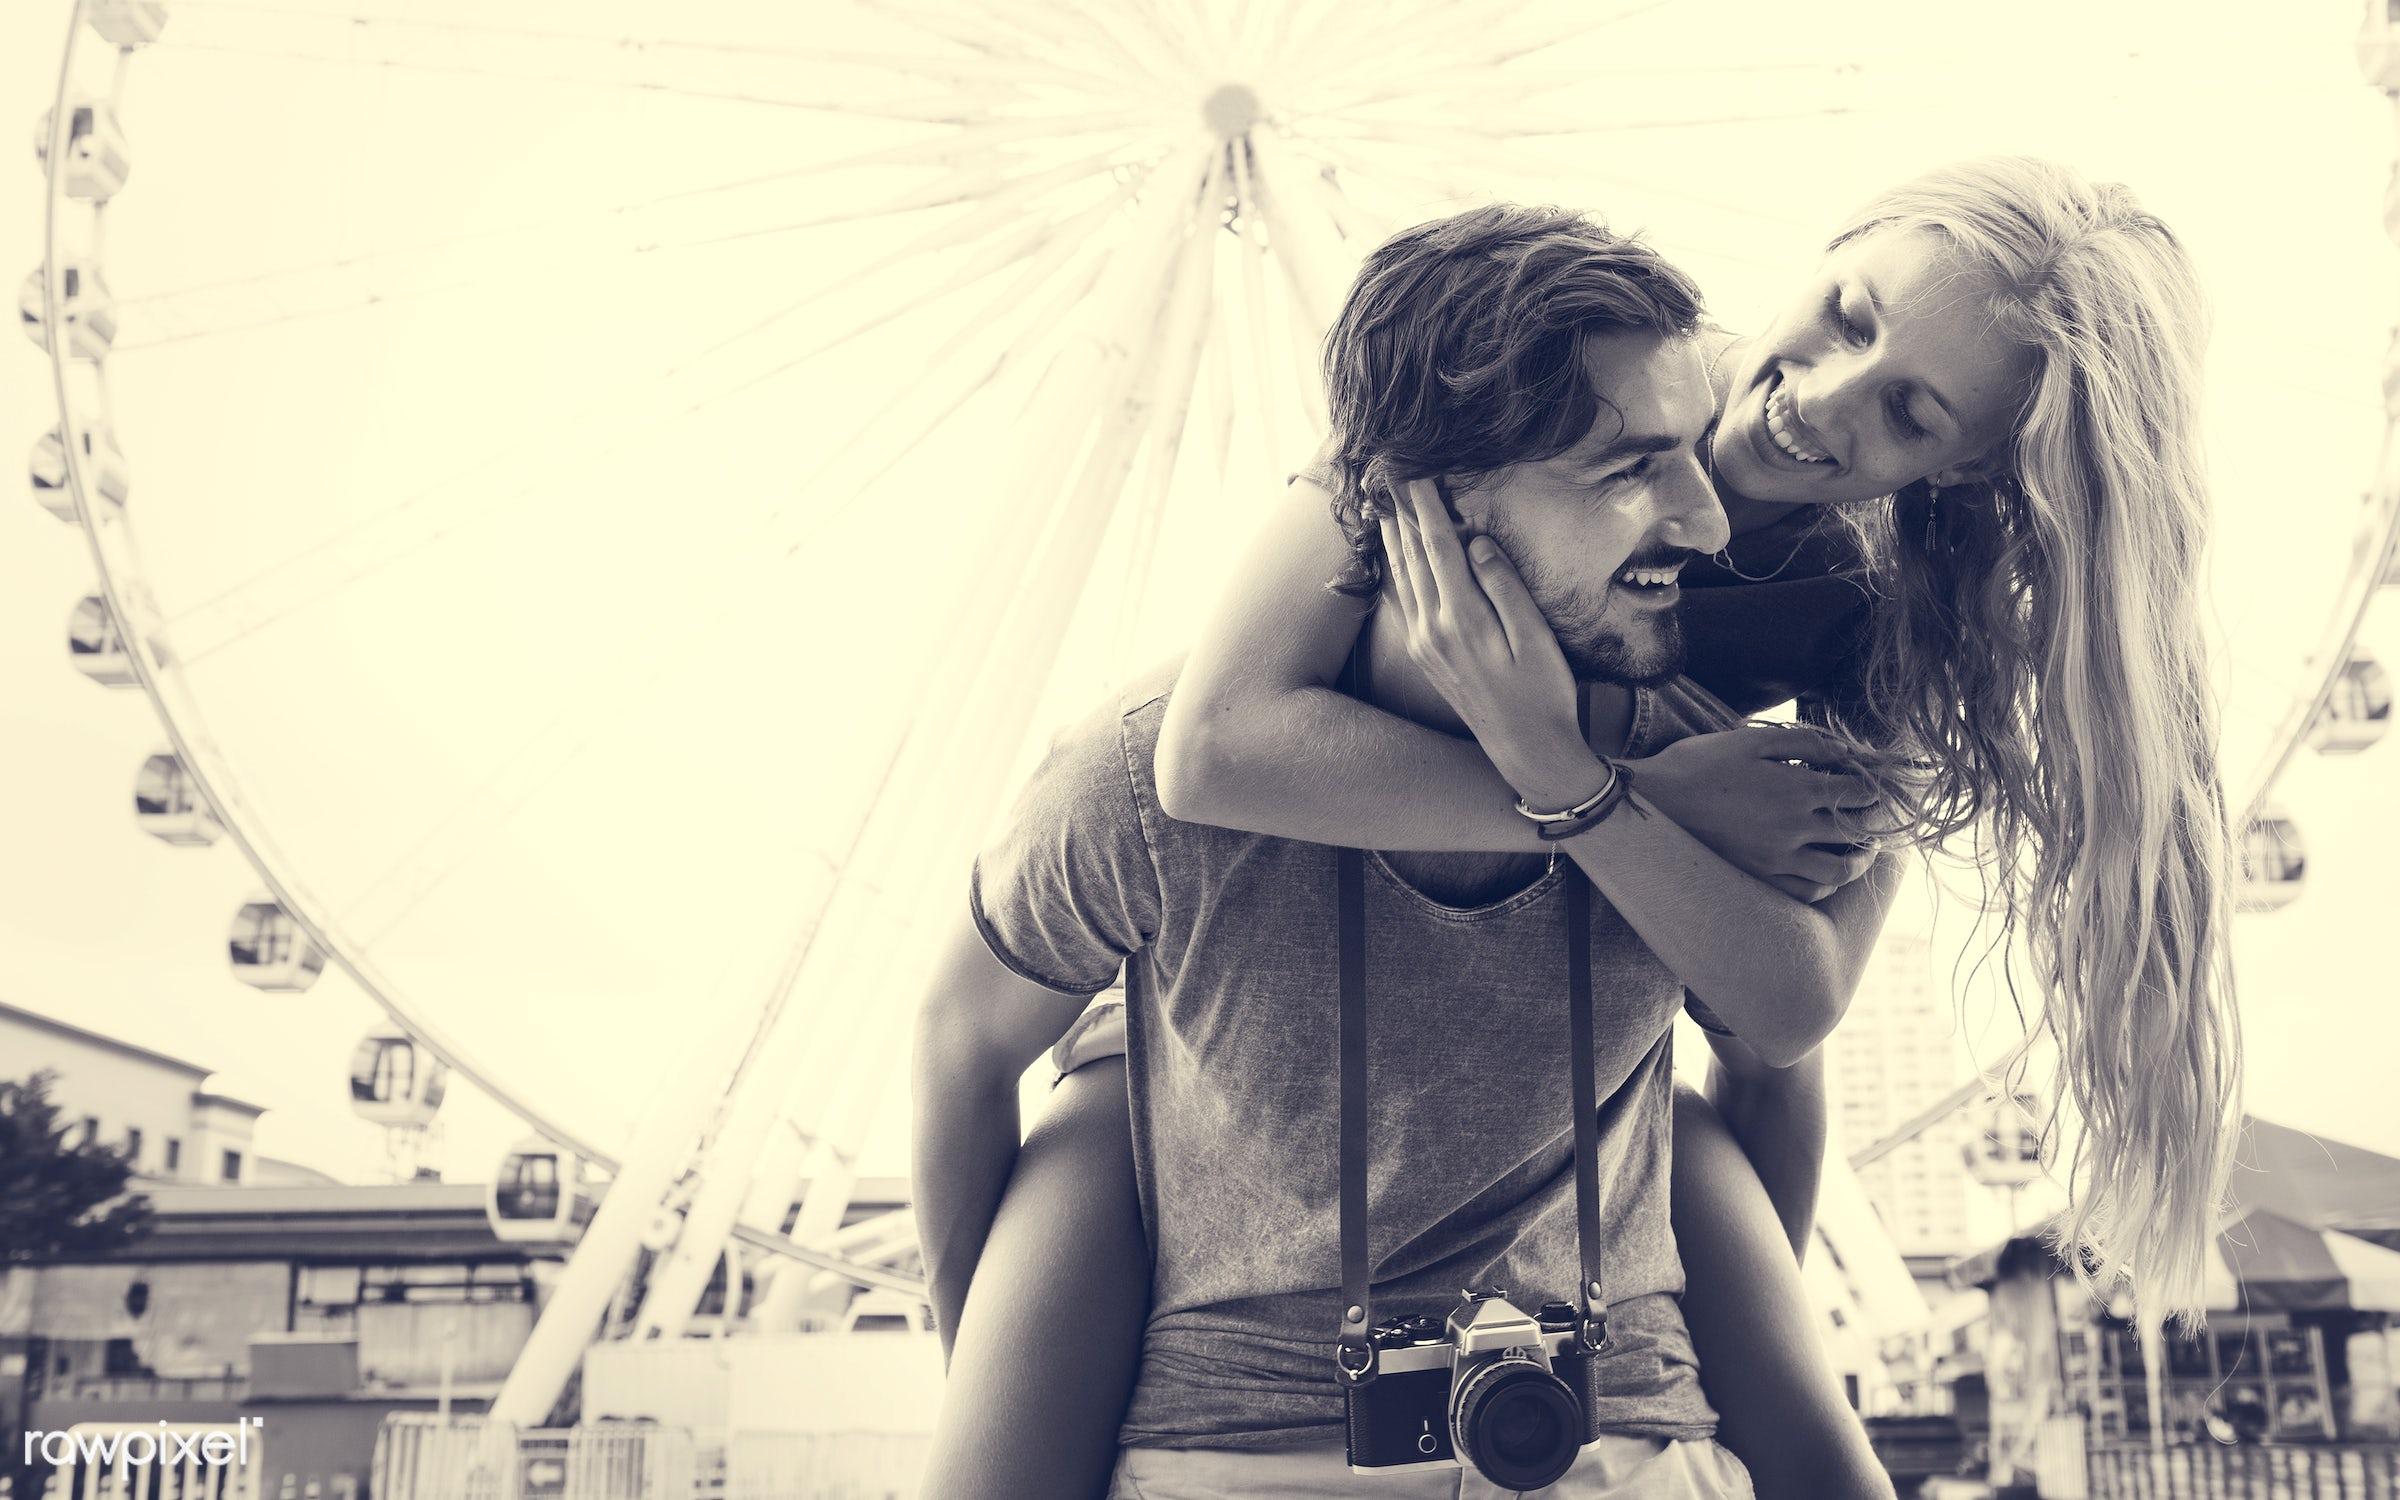 adult, affection, amusement, beard, blonde, bonding, boyfriend, carousel, carrying, casual, caucasian, cheerful, city,...